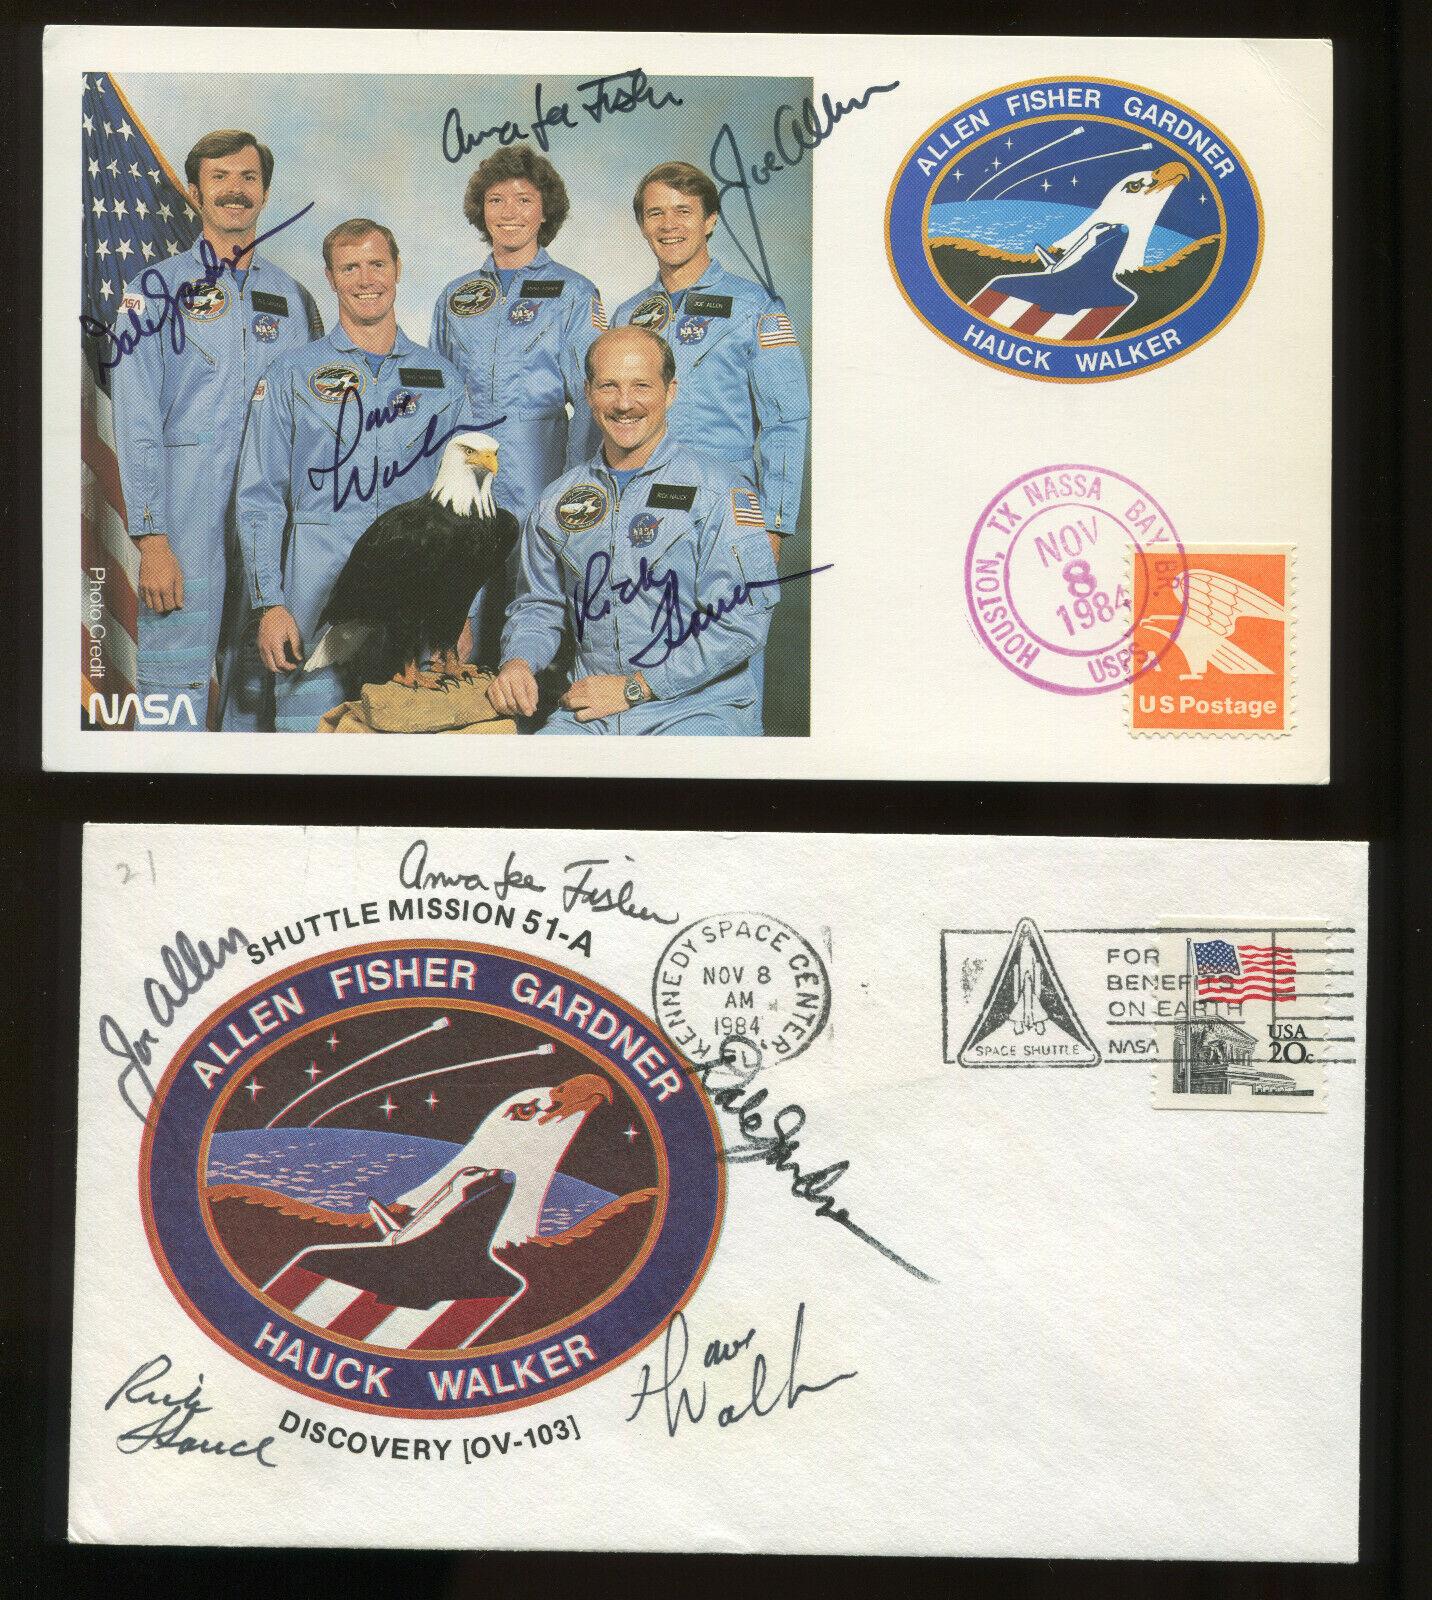 s l1600 - STS-51-A  3 ASTRONAUT CREW SIGNED  ITEMS ALLEN, FISHER, GARDNER, HAUCK